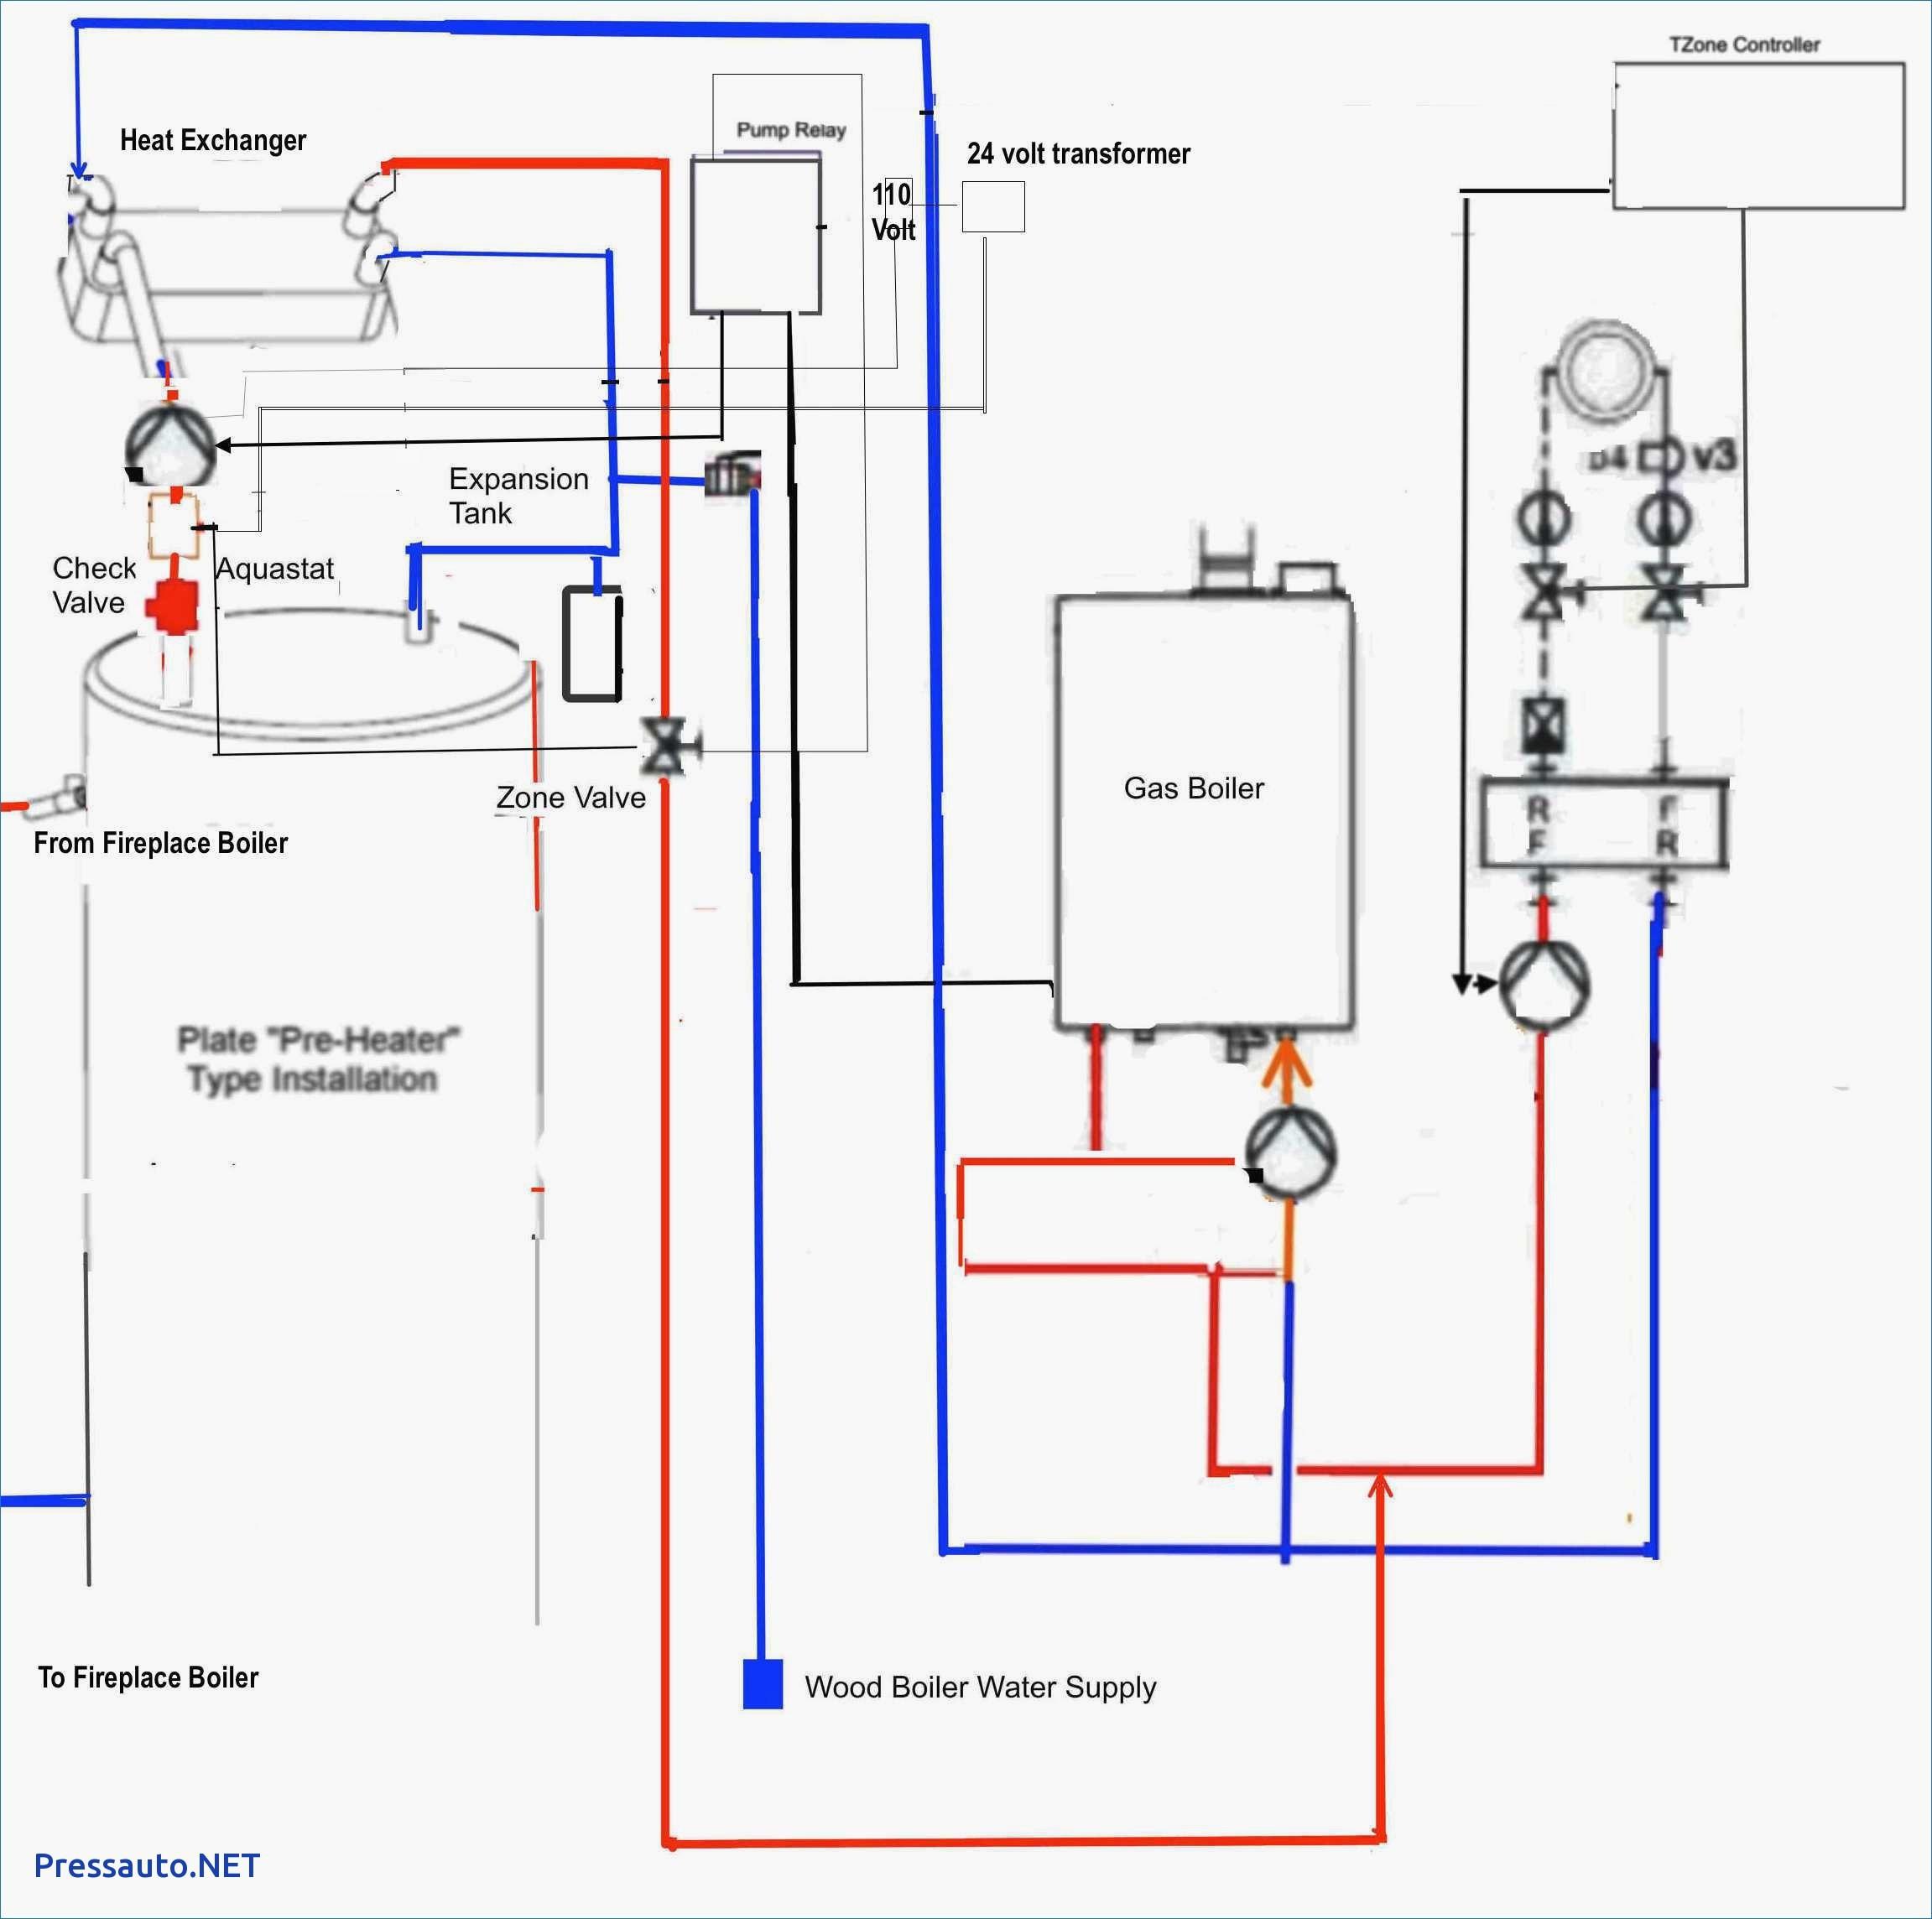 Honeywell Aquastat Wiring Diagram Common C   Wiring Diagram - Honeywell Aquastat L8148E Wiring Diagram